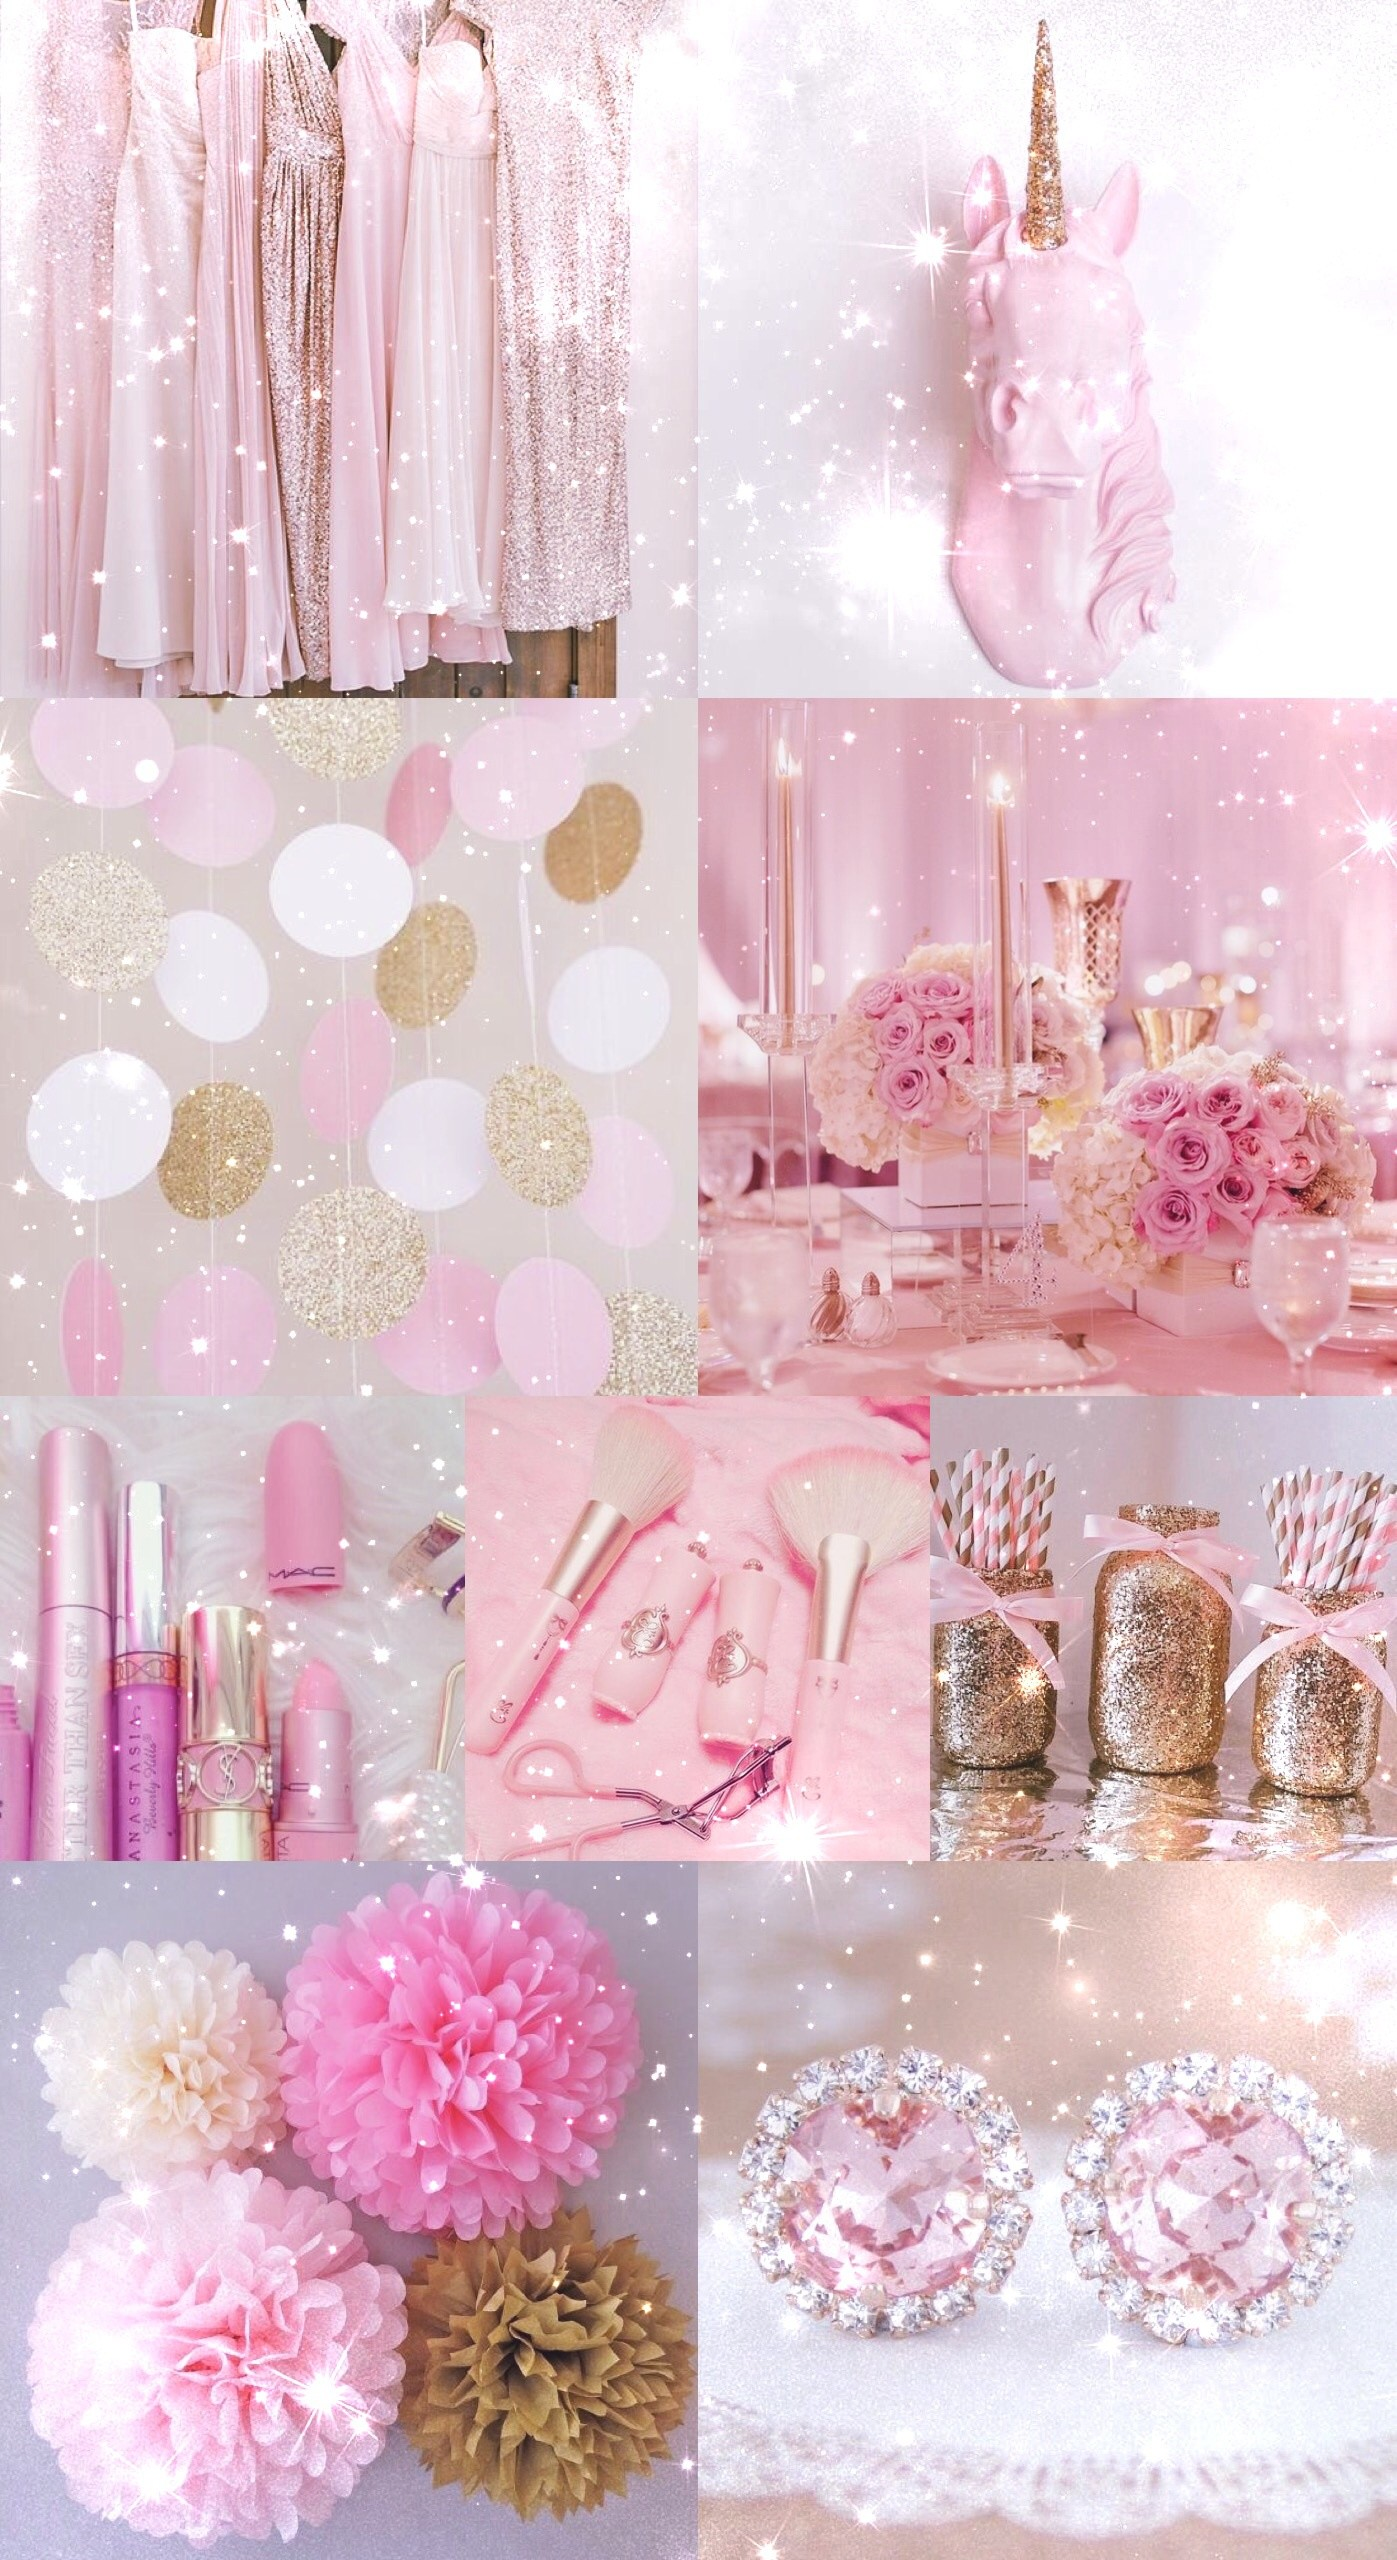 2560x1600 21 Cute Girly Pink Wallpaper HD